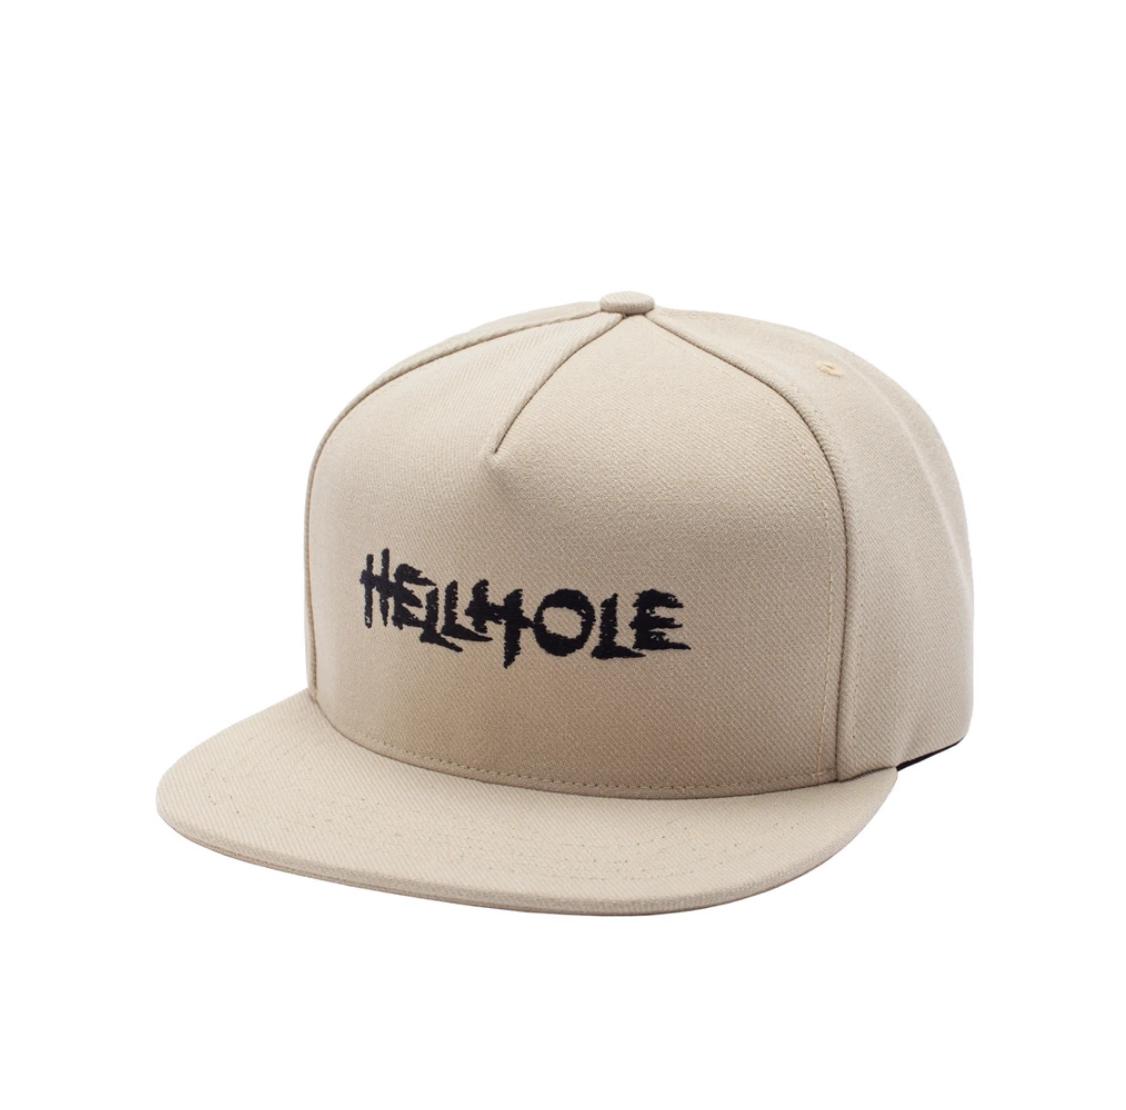 Hockey Hellhole Hat Tan